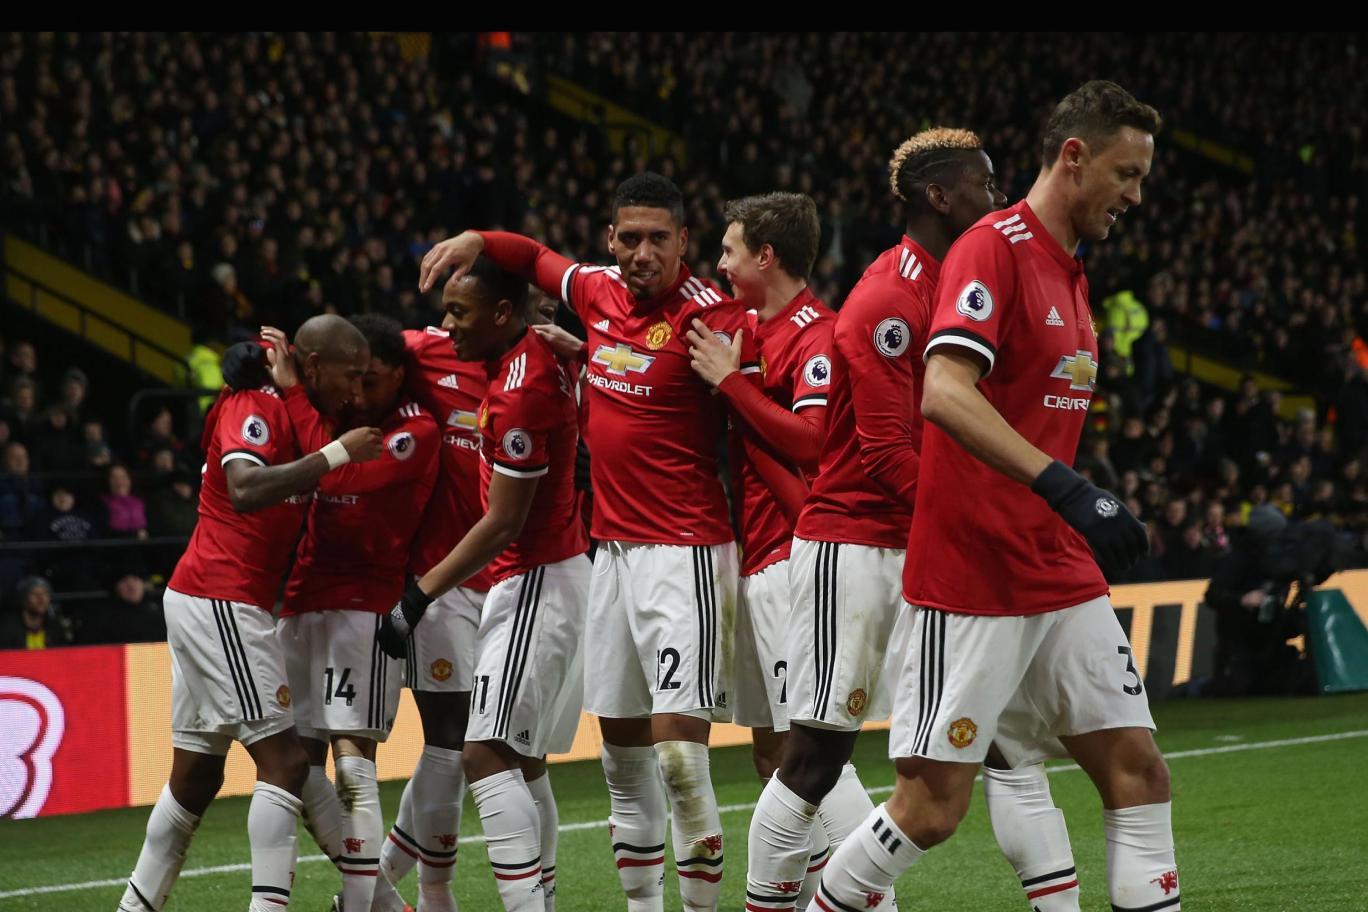 Watford 2-4 Manchester United (Premier League)